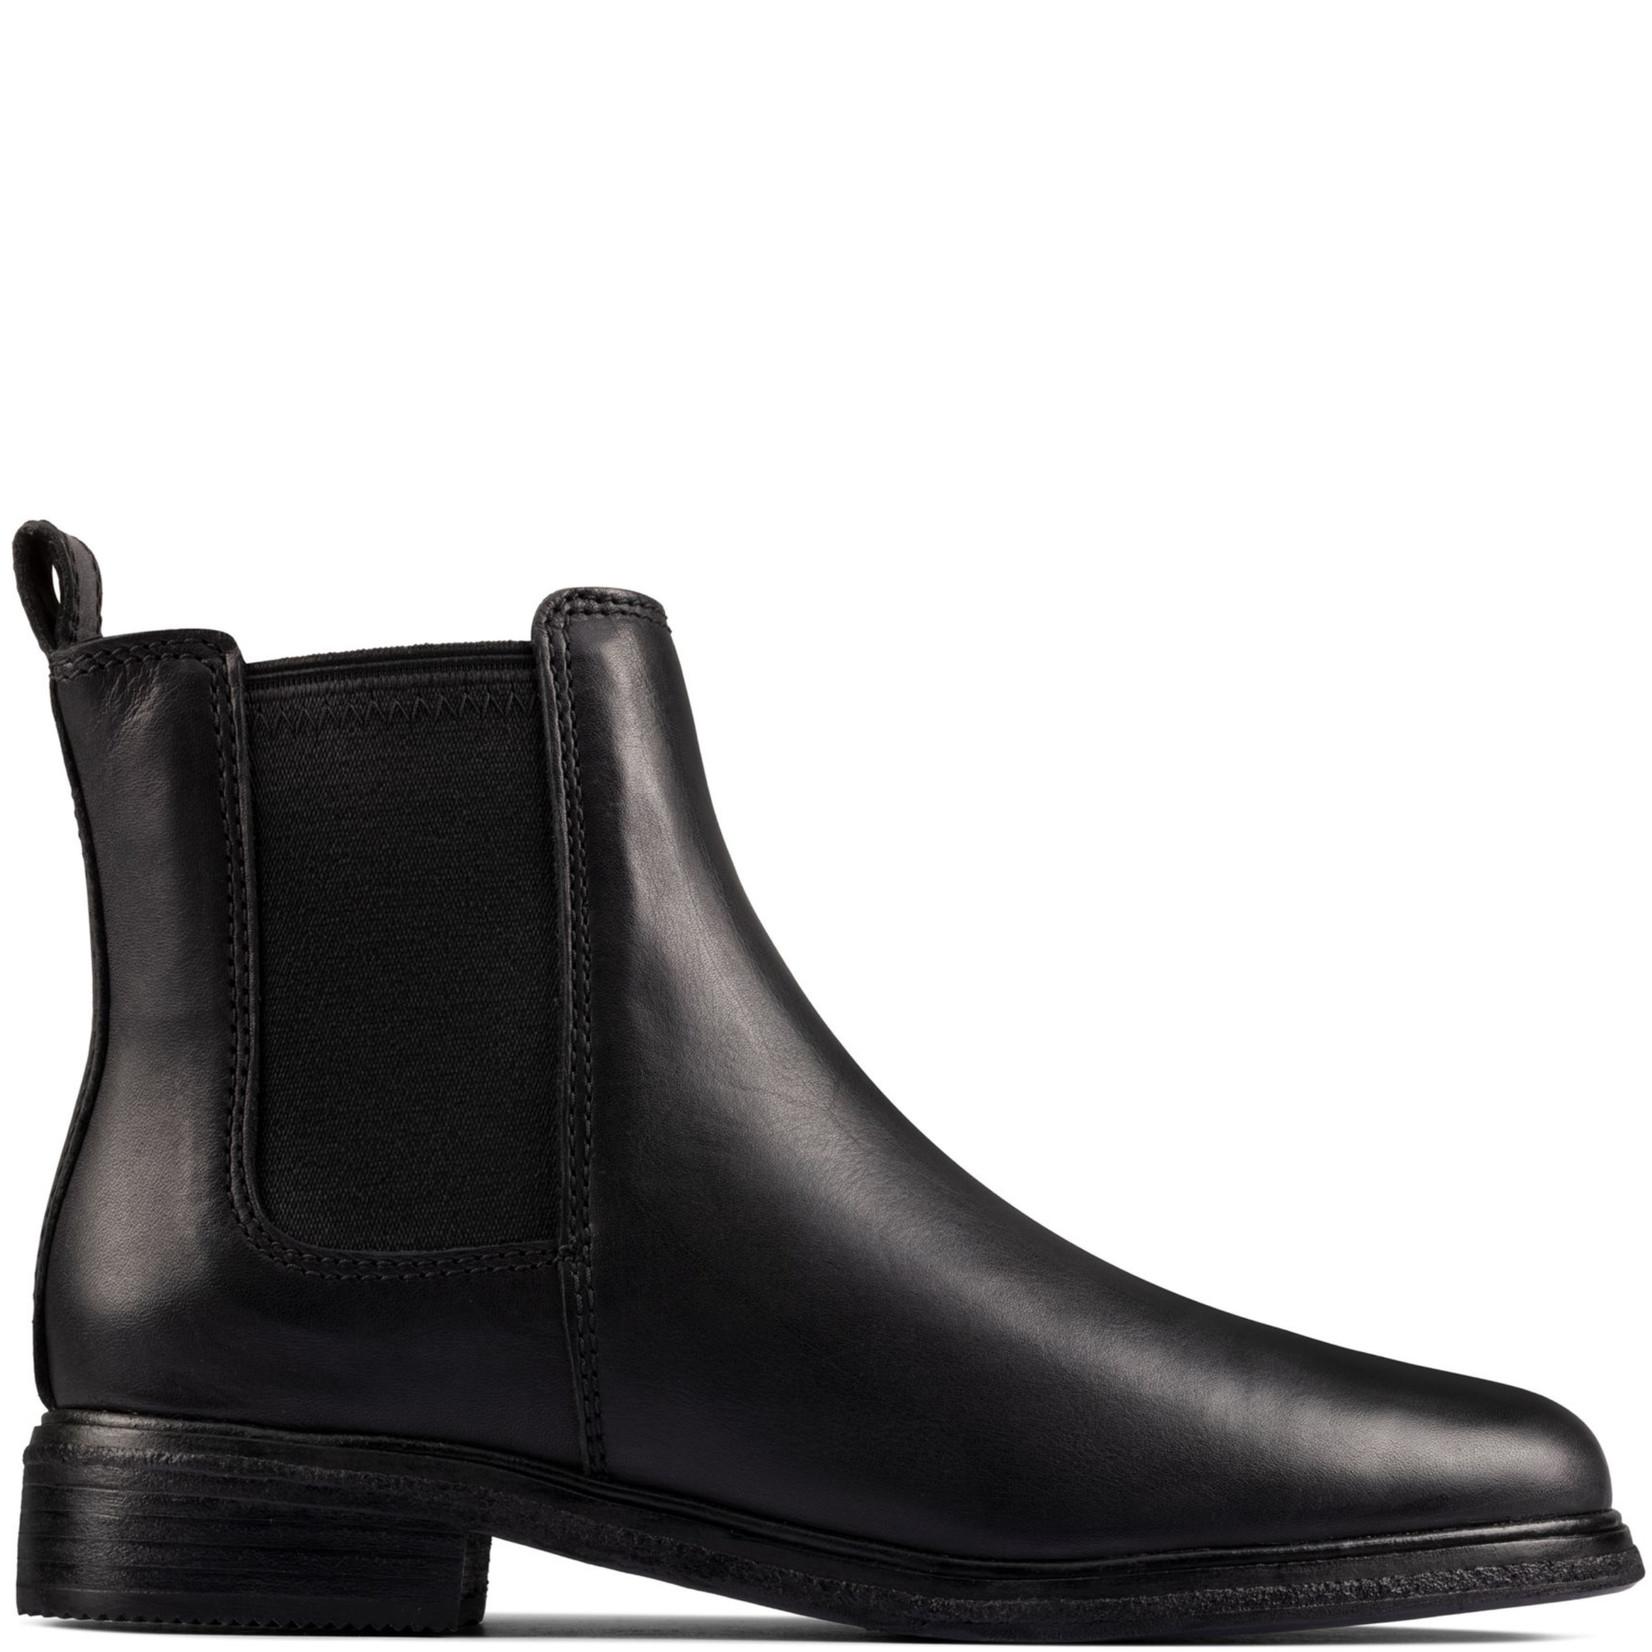 Clarks Clarkdale Arlo Boot Black